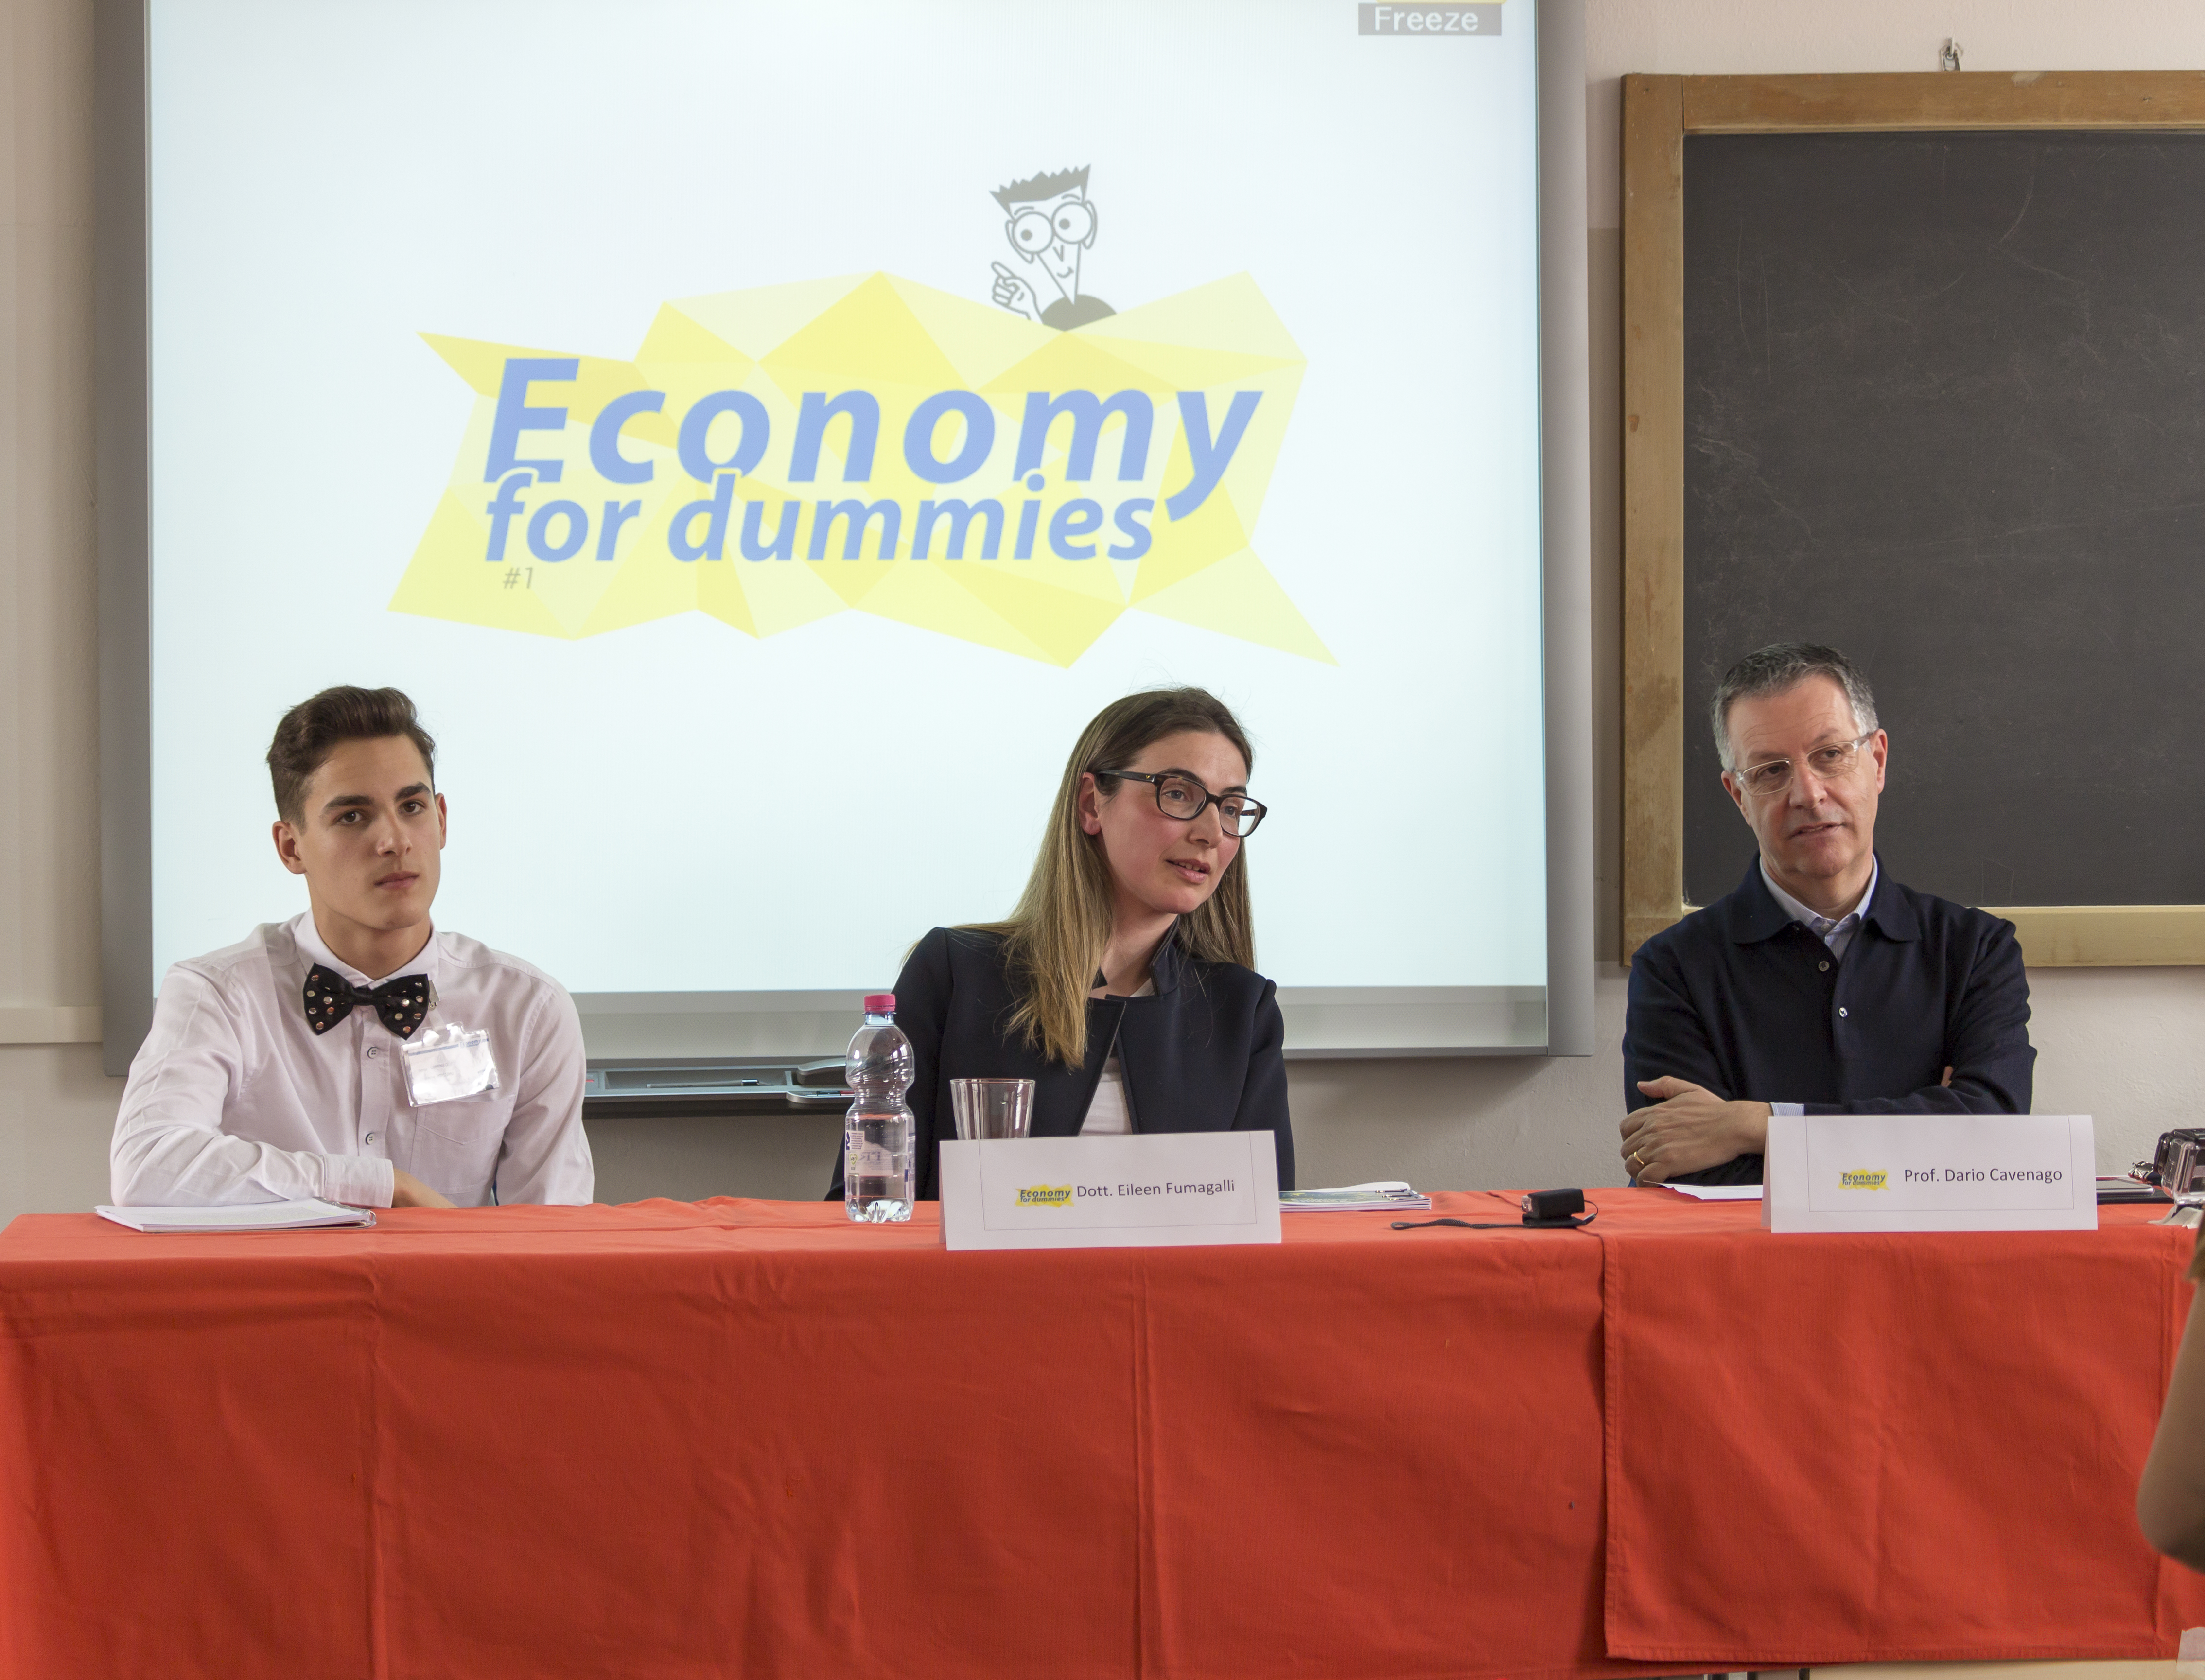 Noi e l'economia